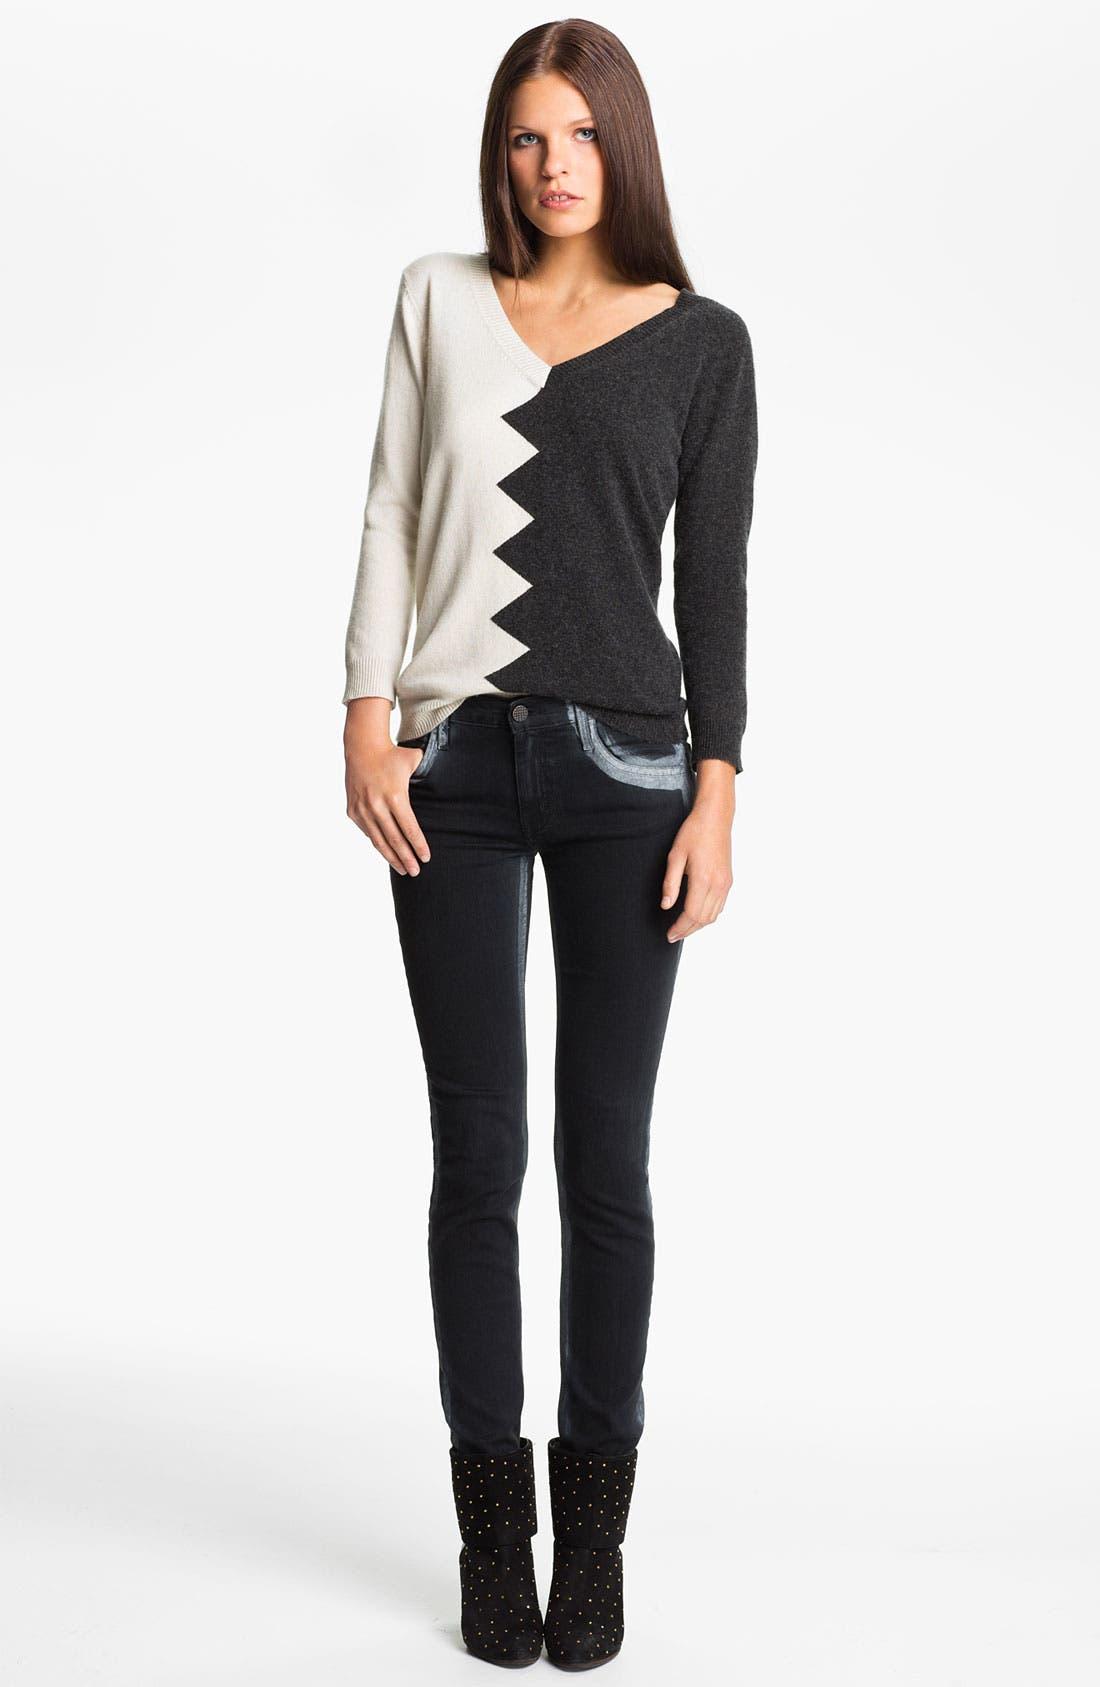 Main Image - Kelly Wearstler 'Zigzag Slither' V-Neck Pullover